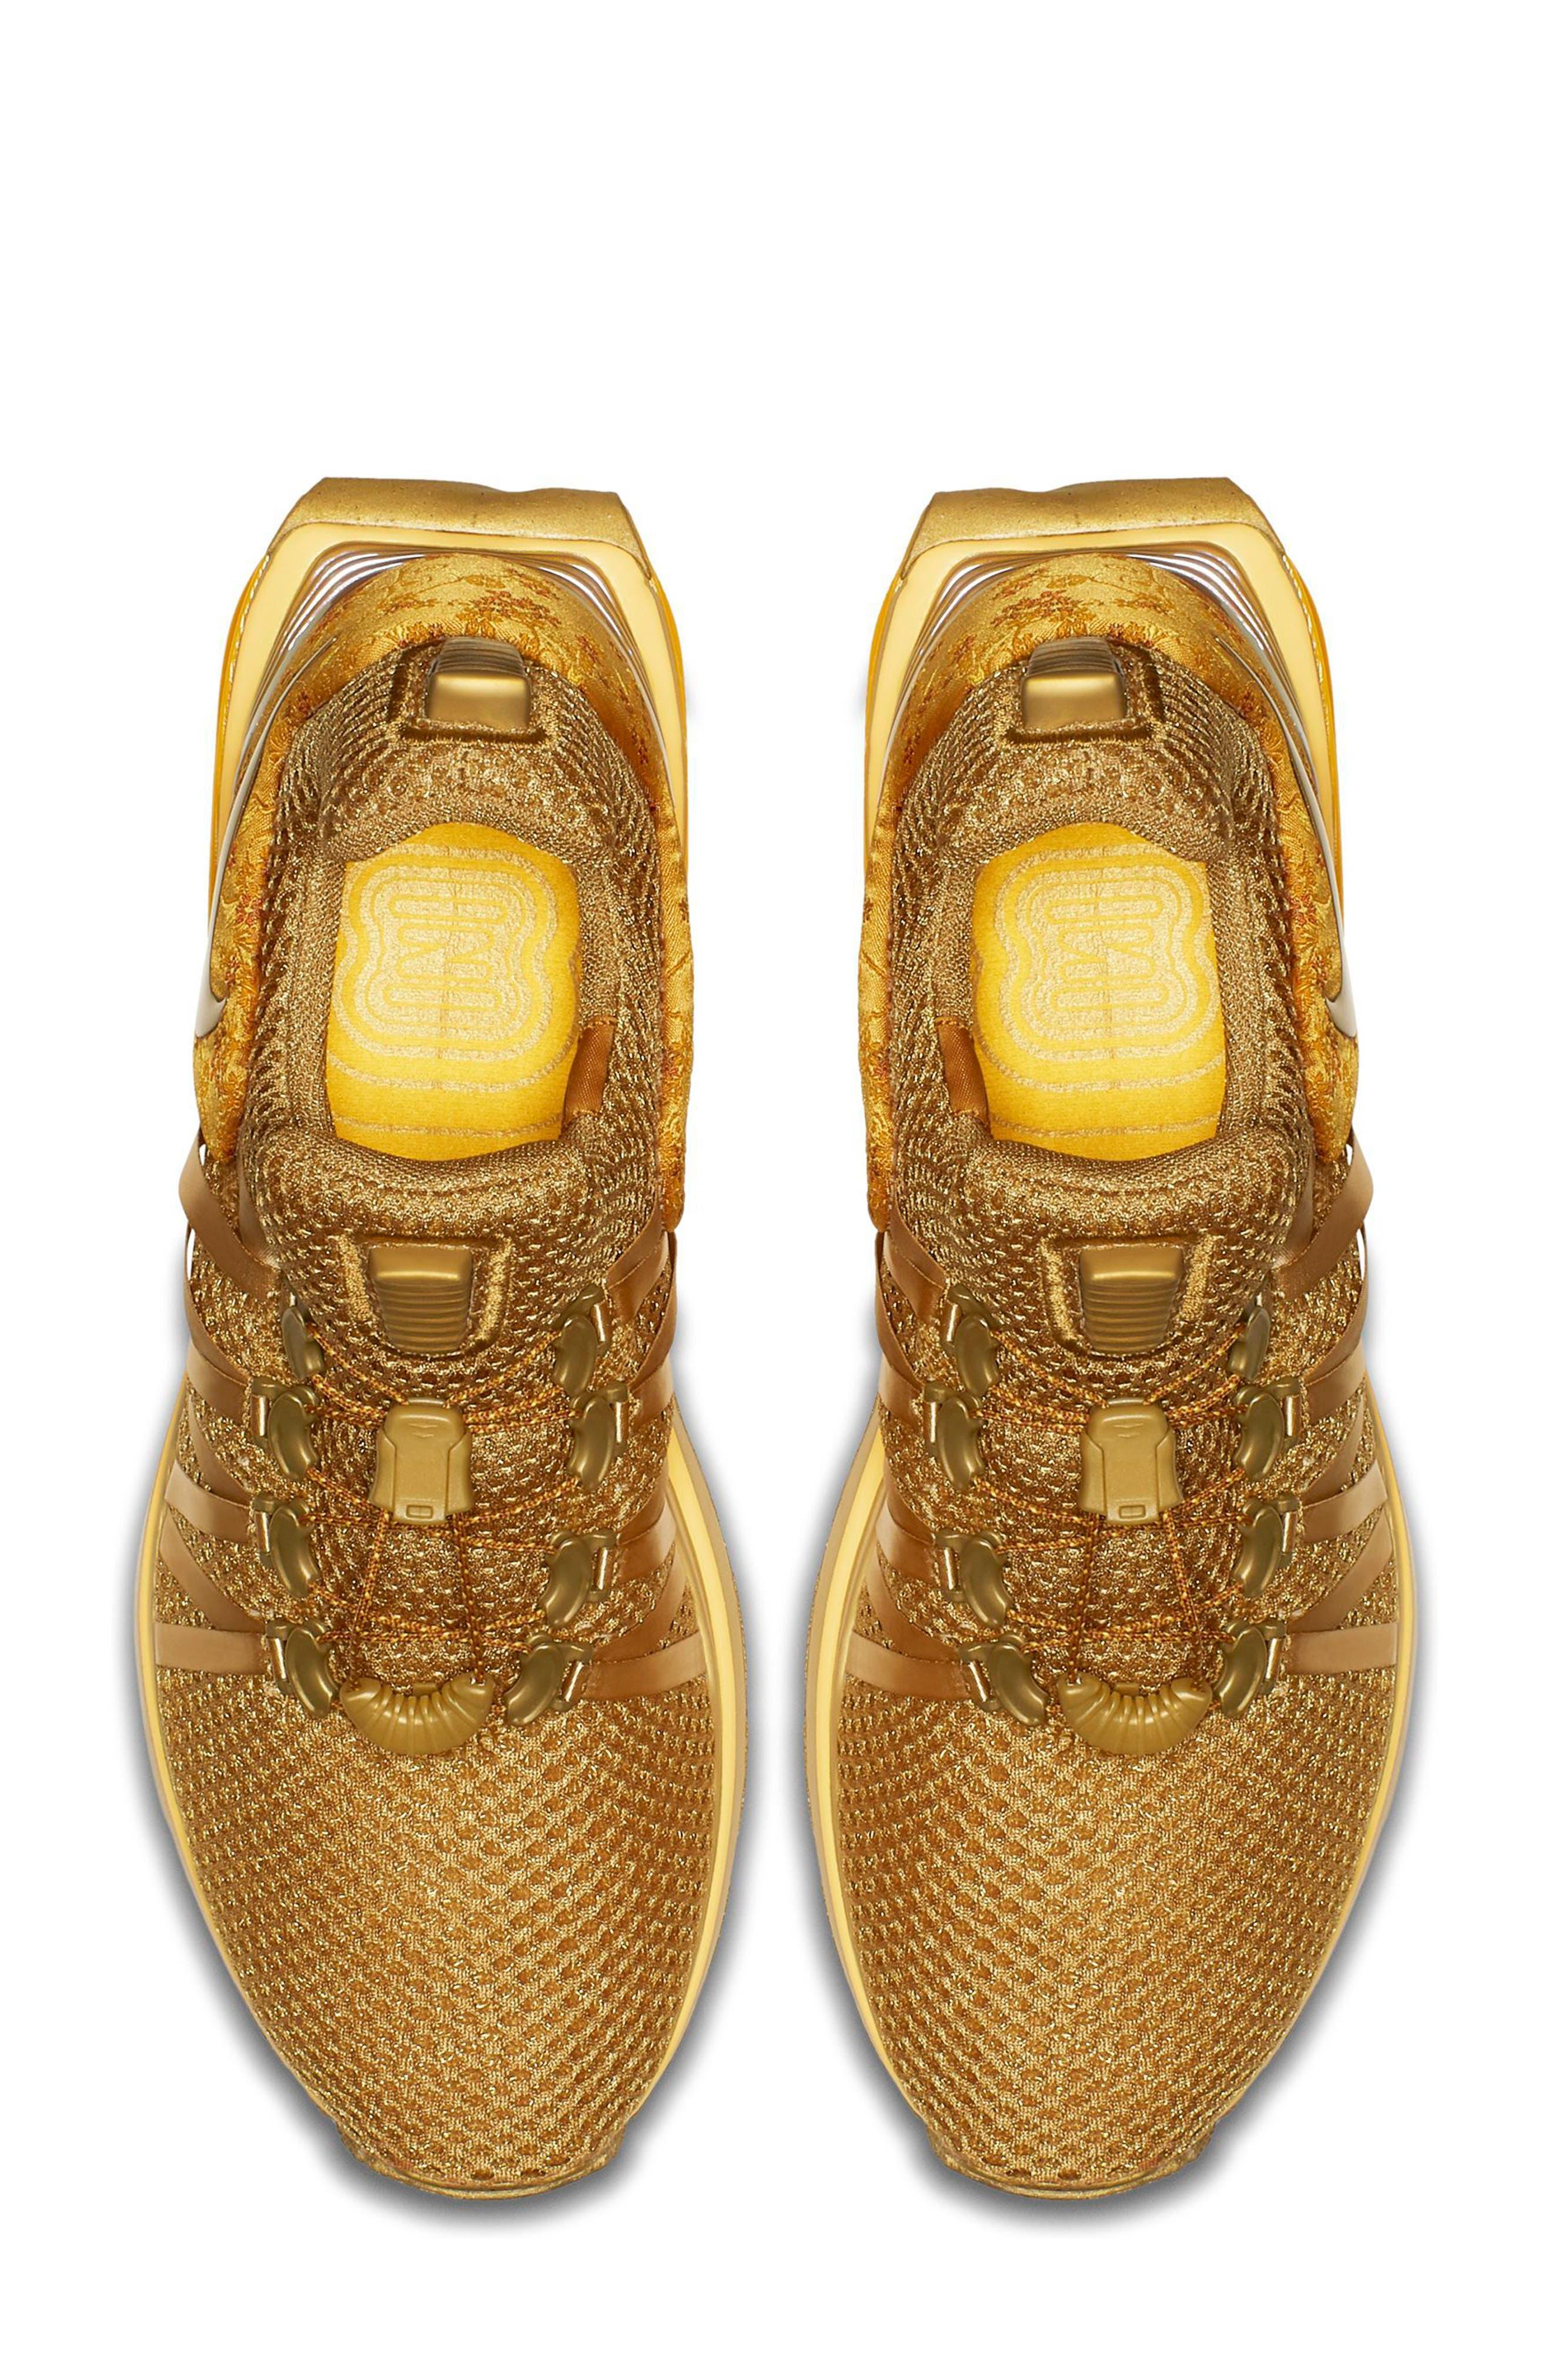 Shox Gravity Sneaker,                             Alternate thumbnail 4, color,                             Metallic Gold/ Metallic Gold